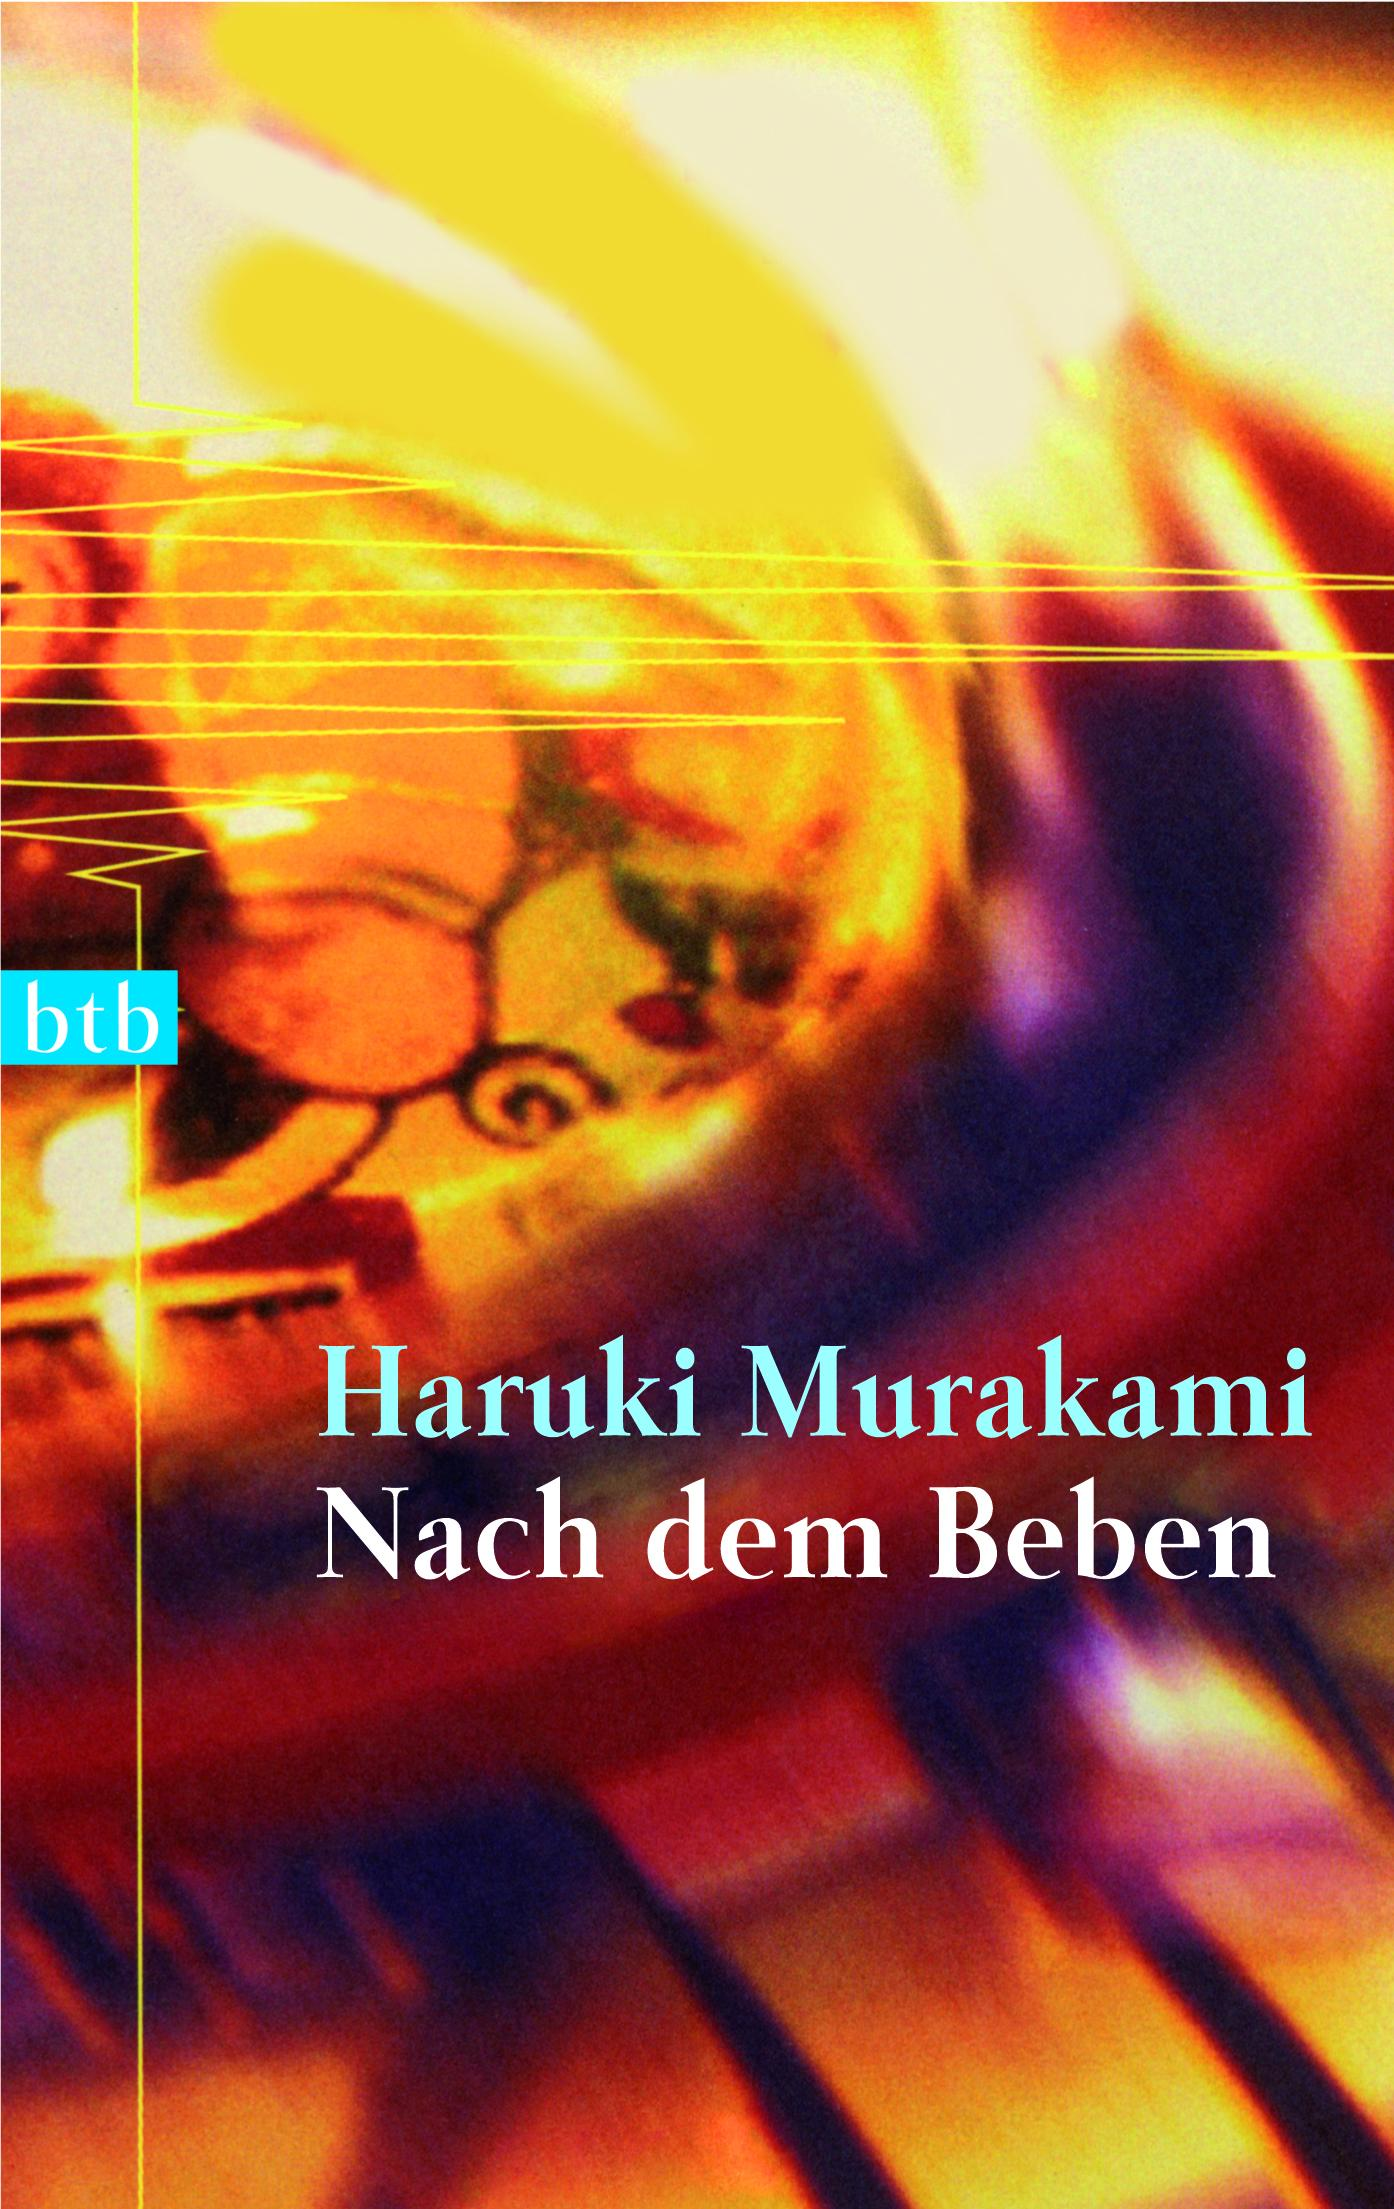 Nach dem Beben von Haruki Murakami